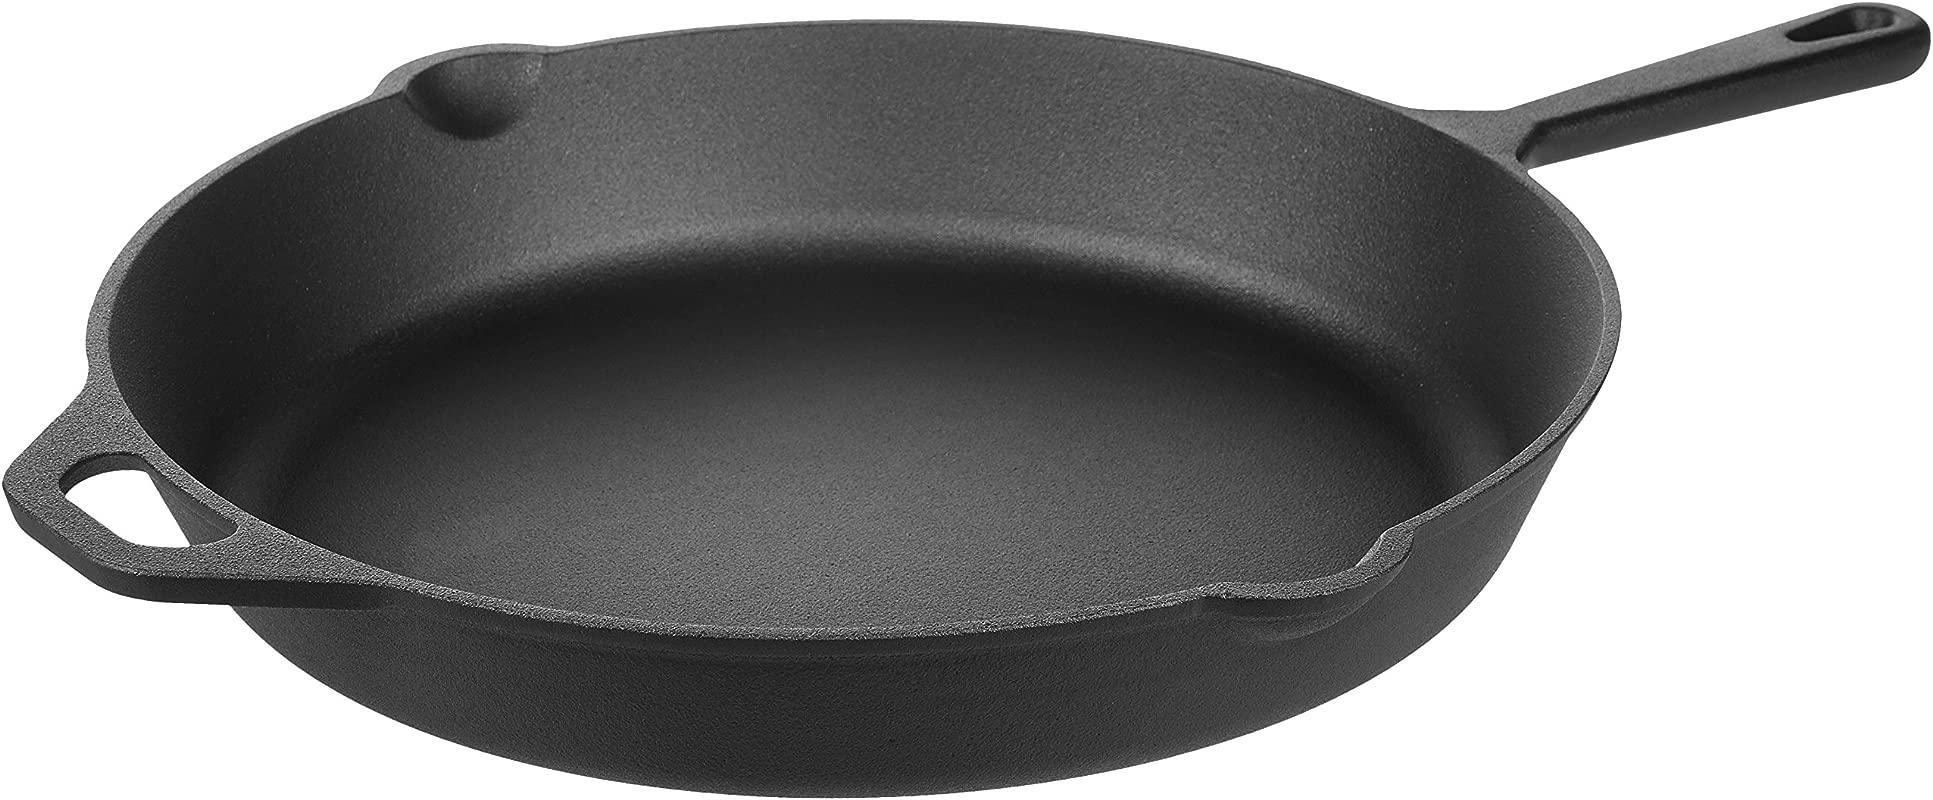 AmazonBasics Pre Seasoned Cast Iron Skillet Pan 15 Inch